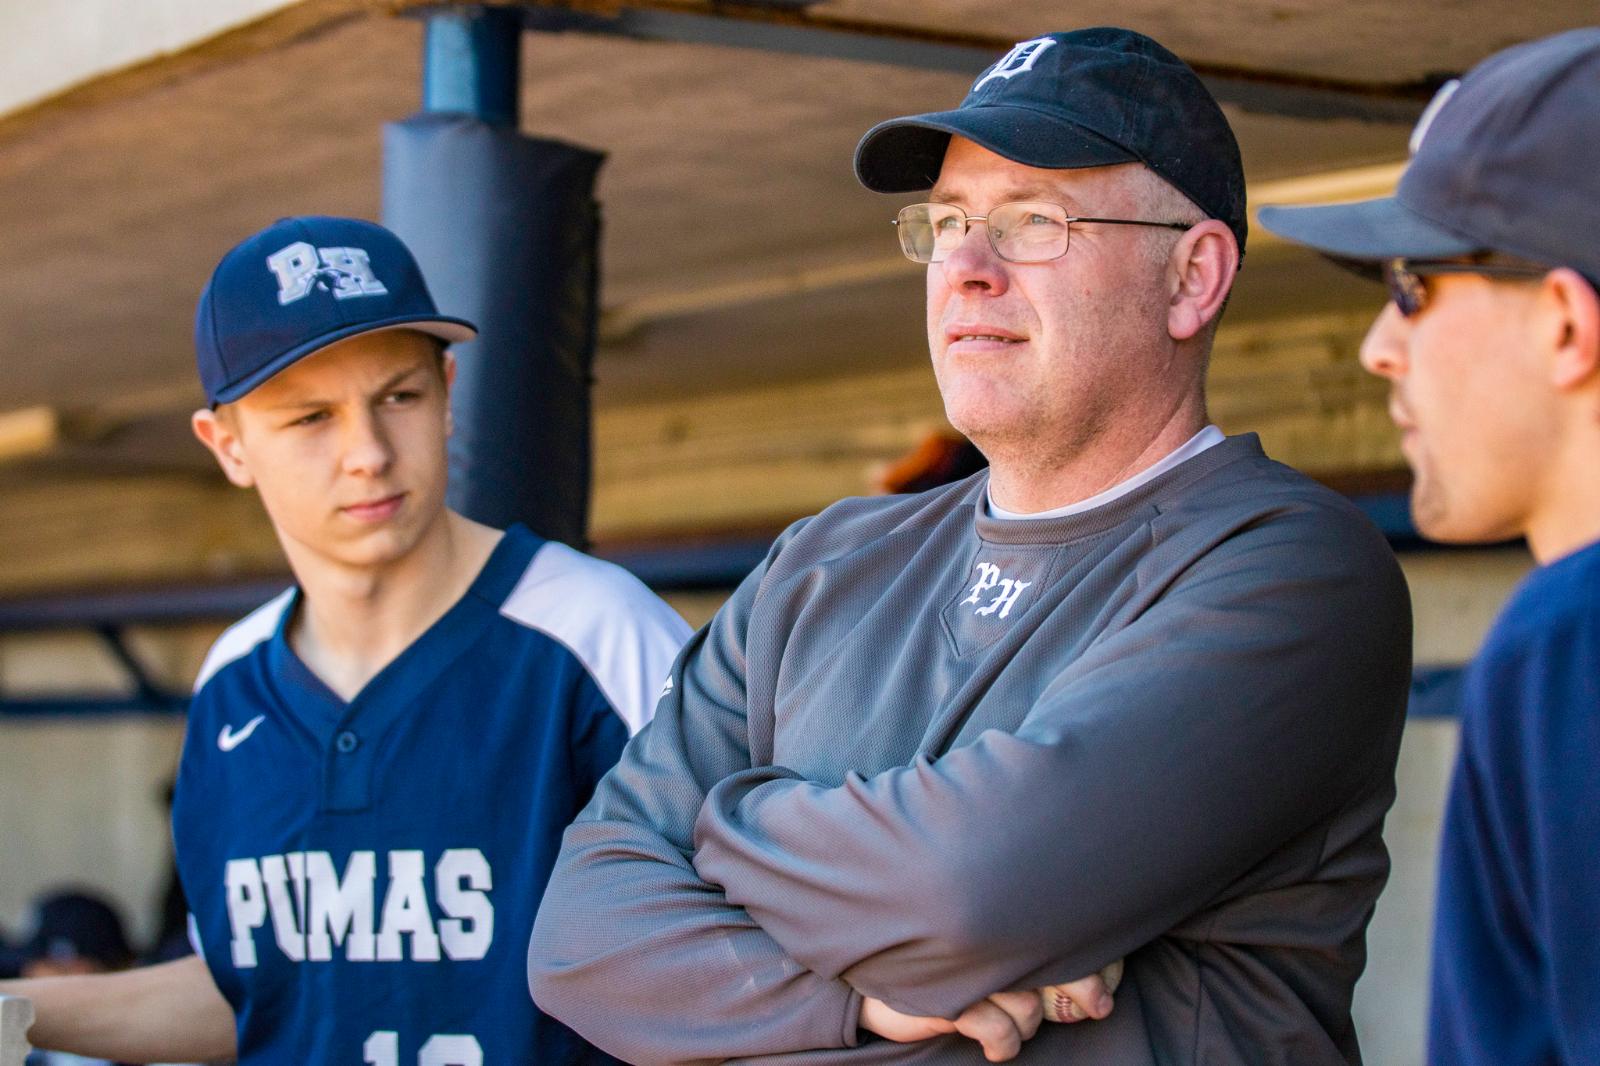 Robb Fynewever-Muyskens hired to lead Baseball program